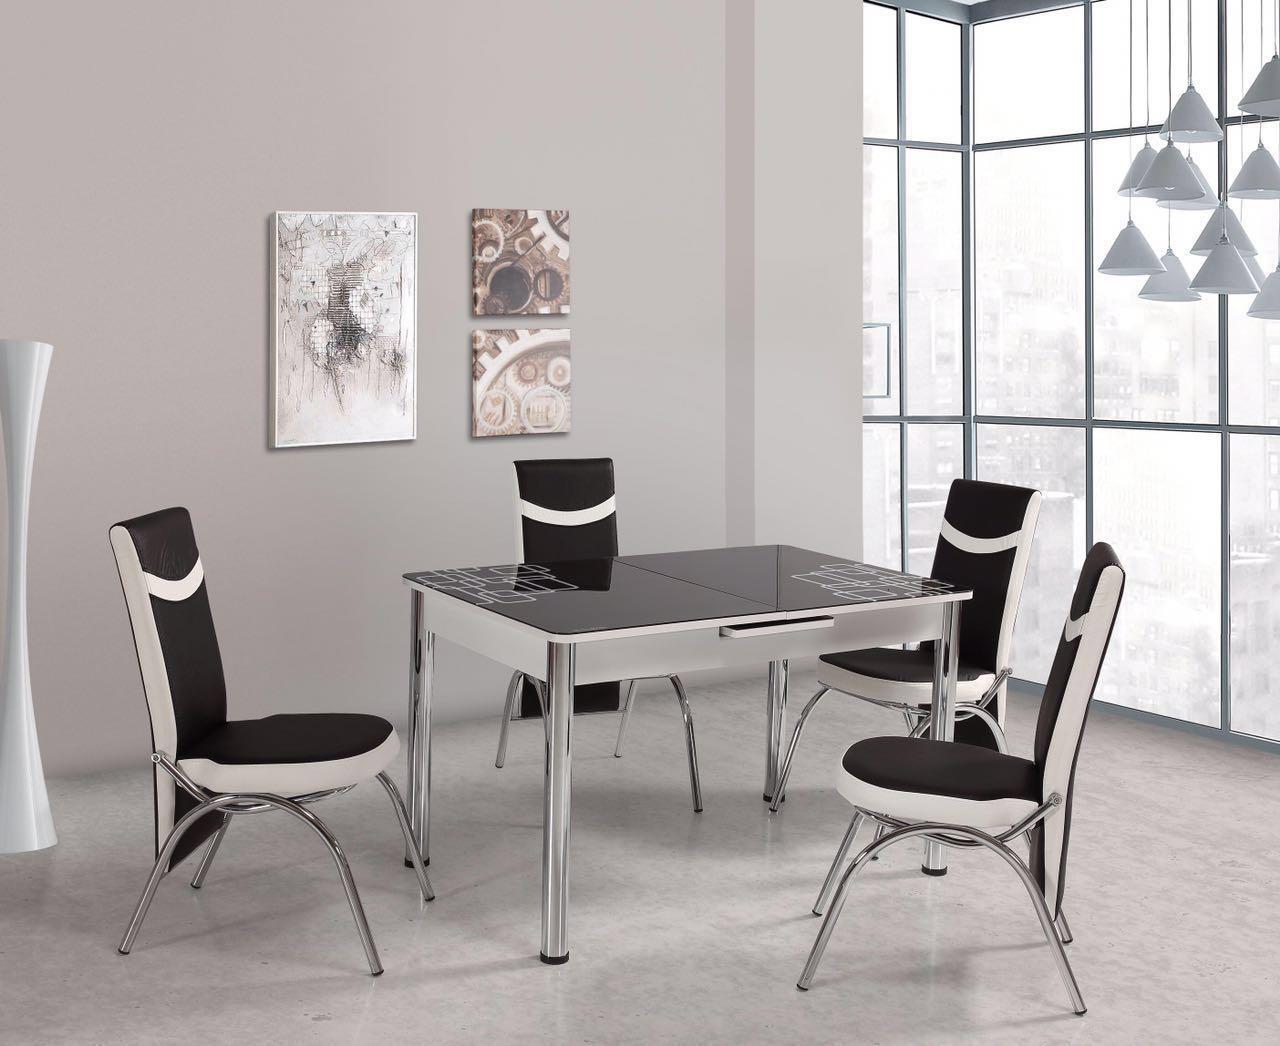 tables mak petit prix nkl meuble wassa et deco. Black Bedroom Furniture Sets. Home Design Ideas